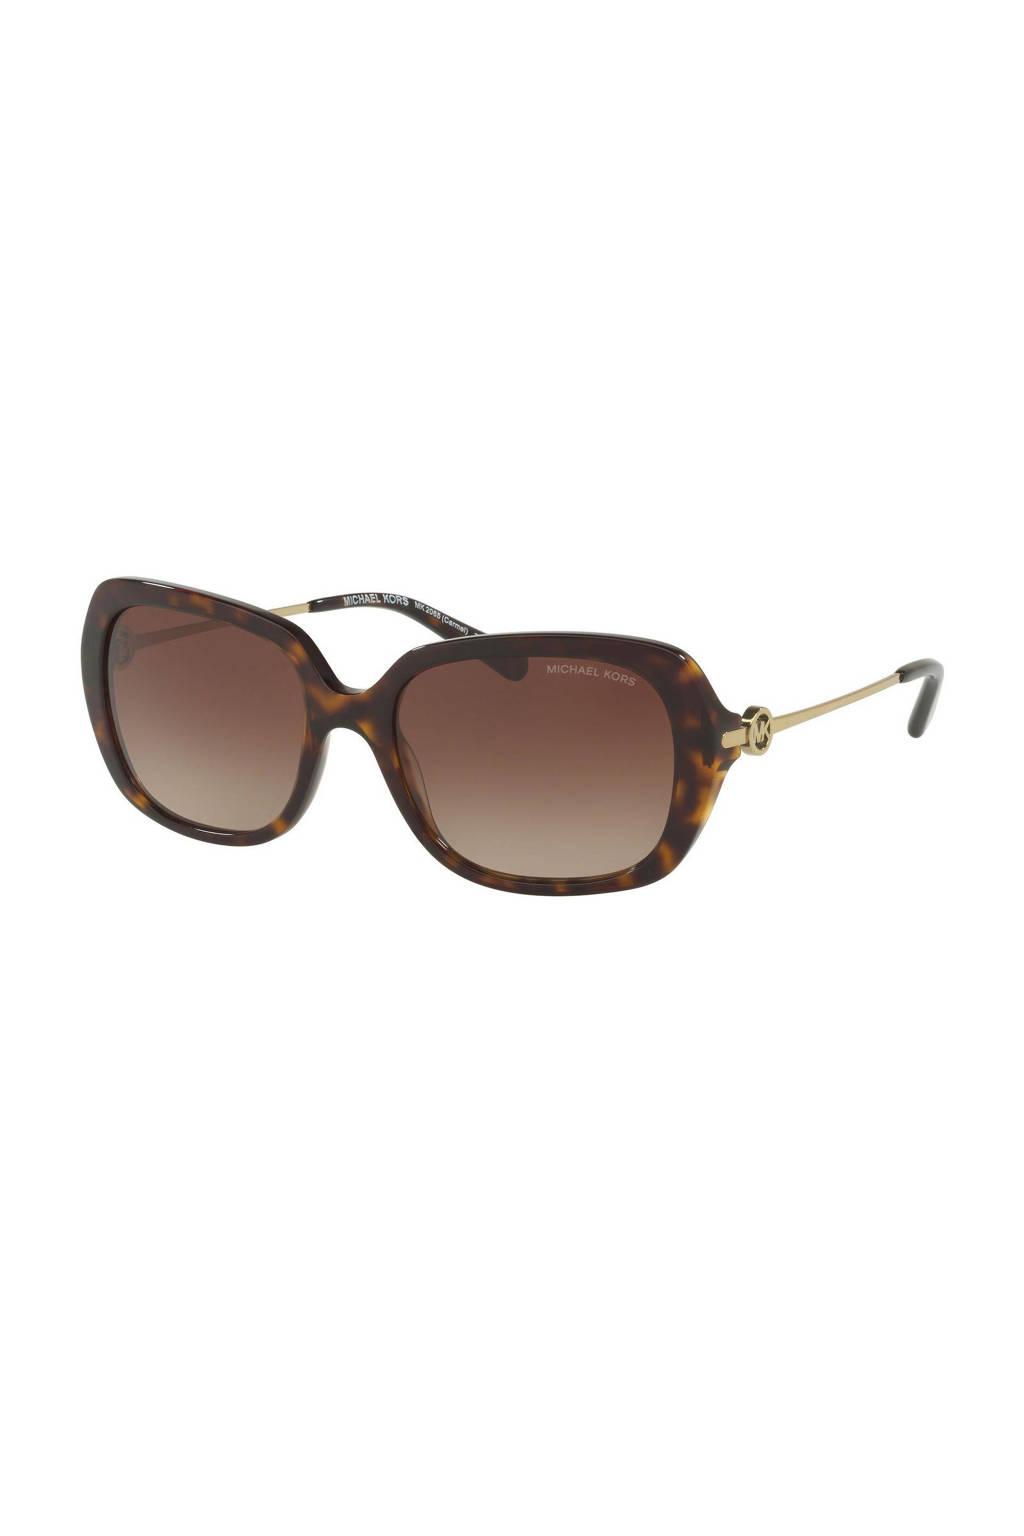 Michael Kors zonnebril 0MK2065, Grijs